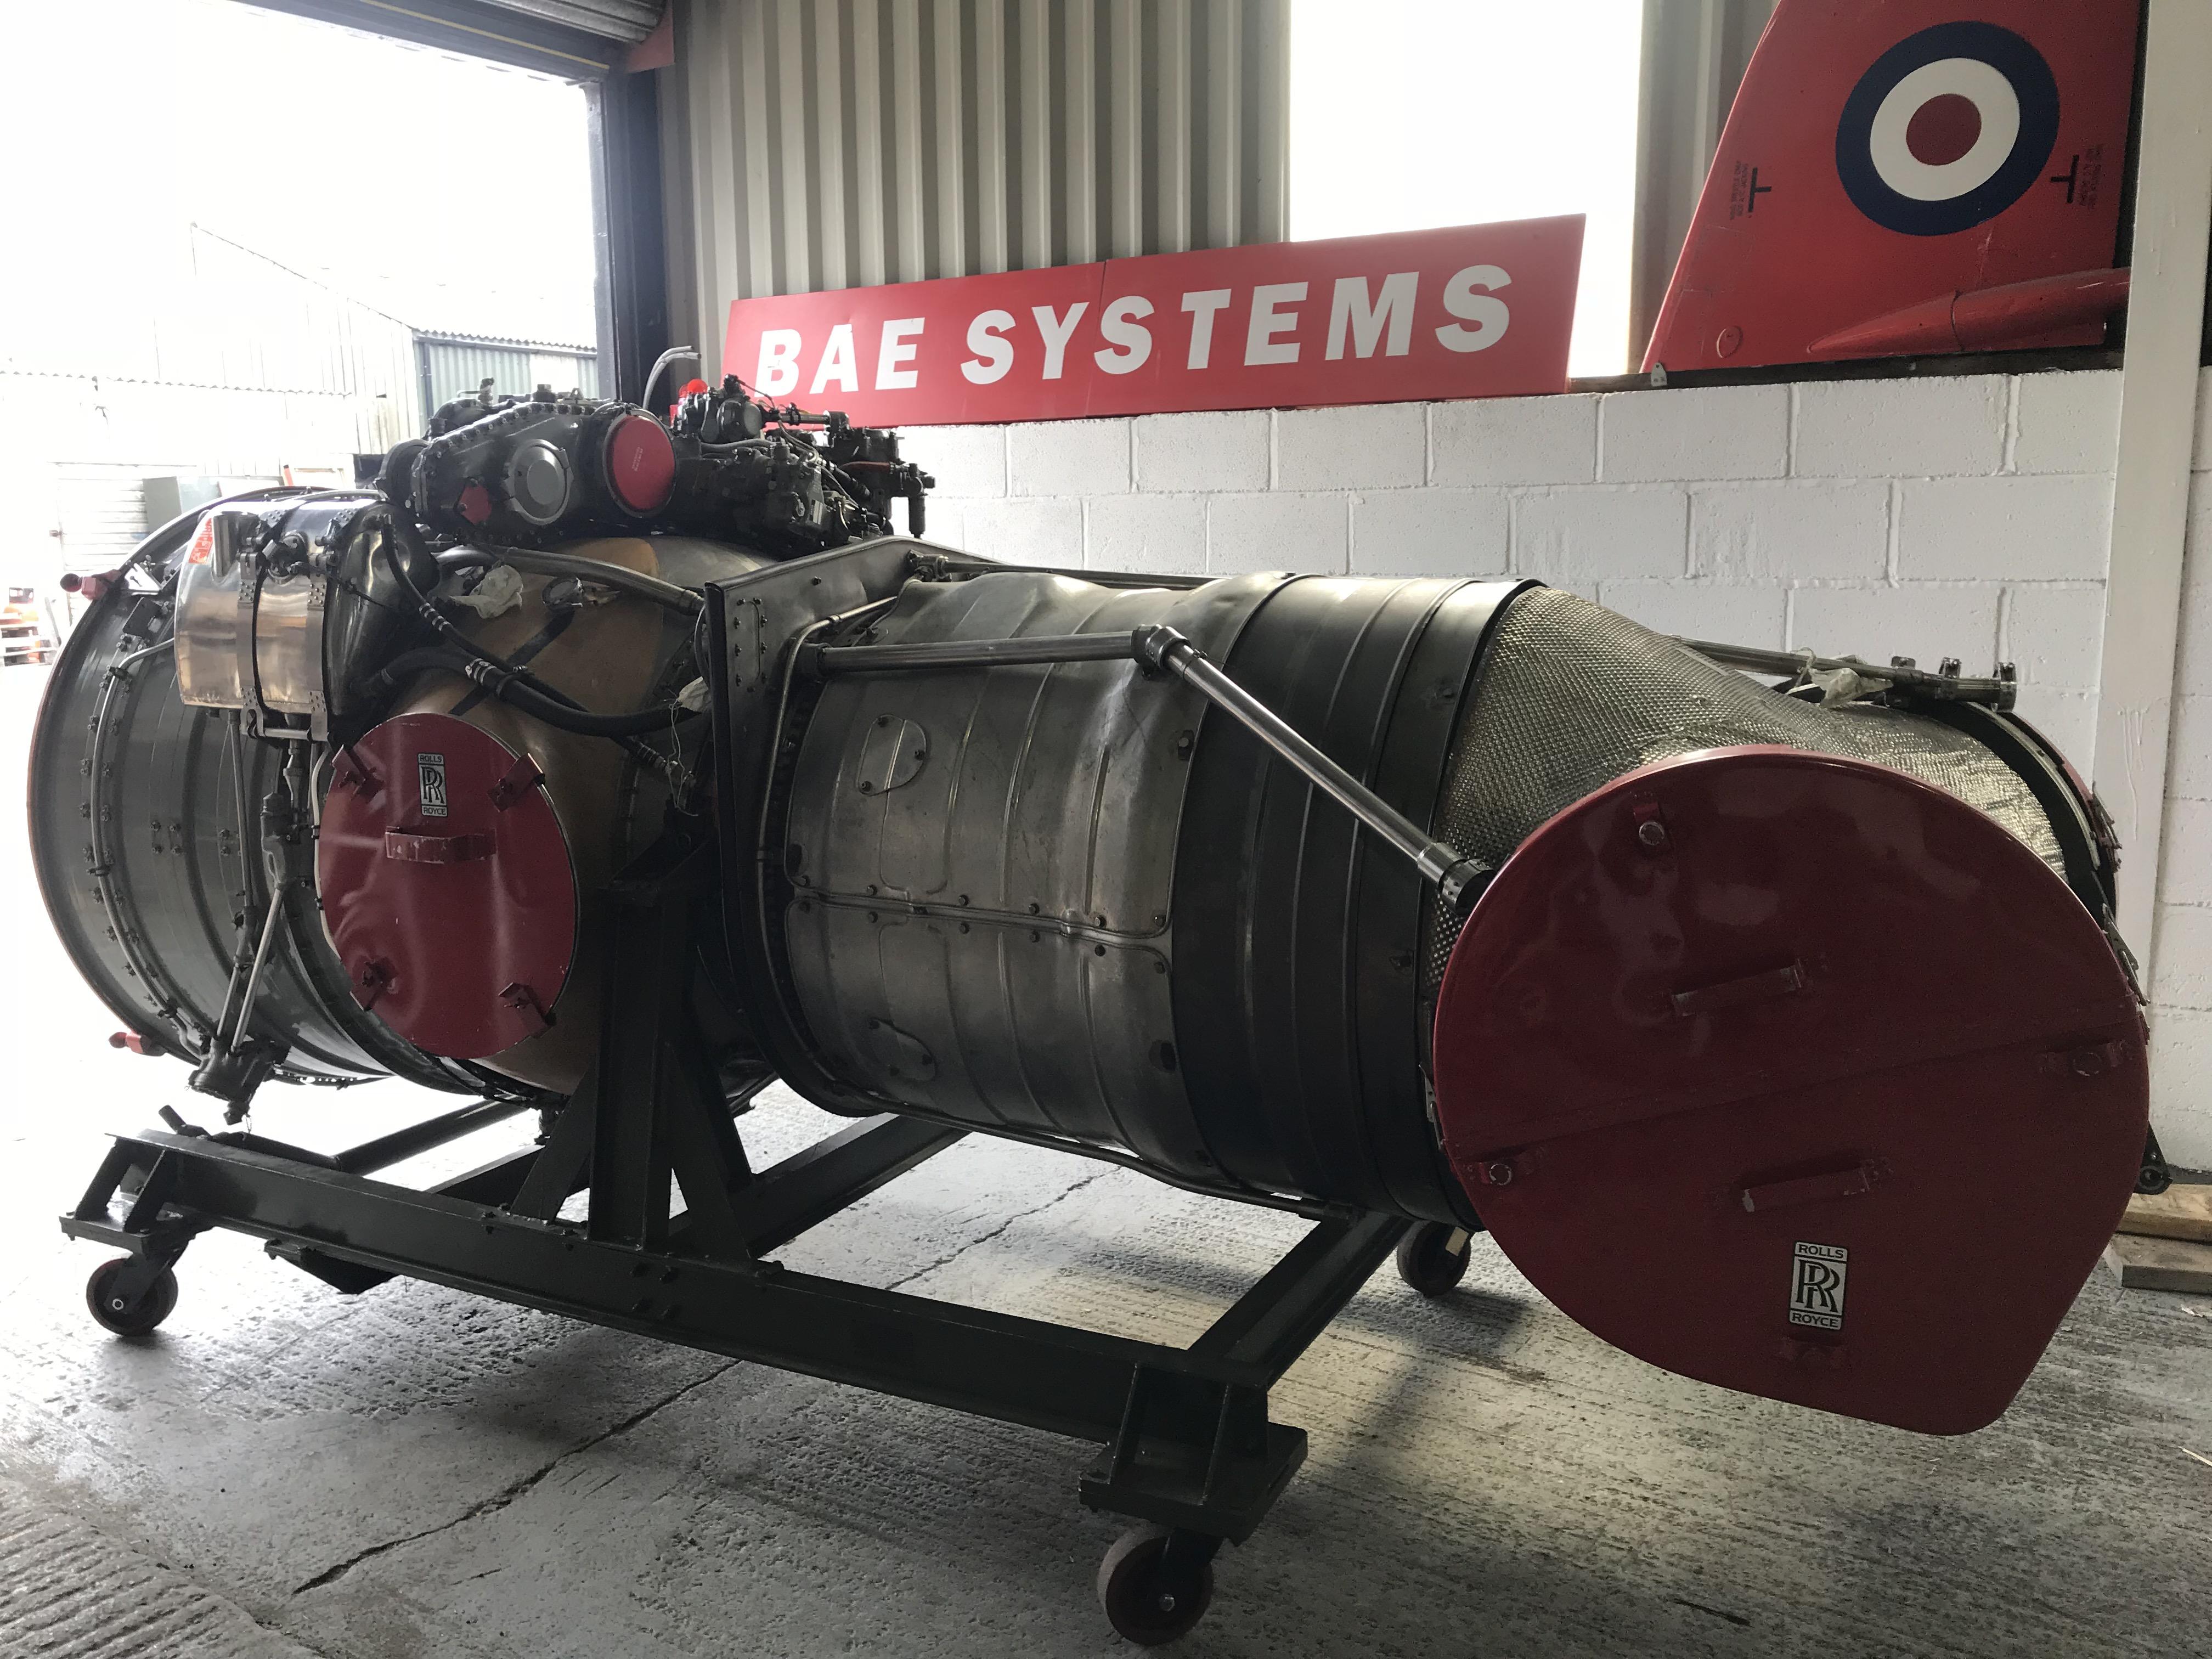 Rolls Royce Pegasus engine